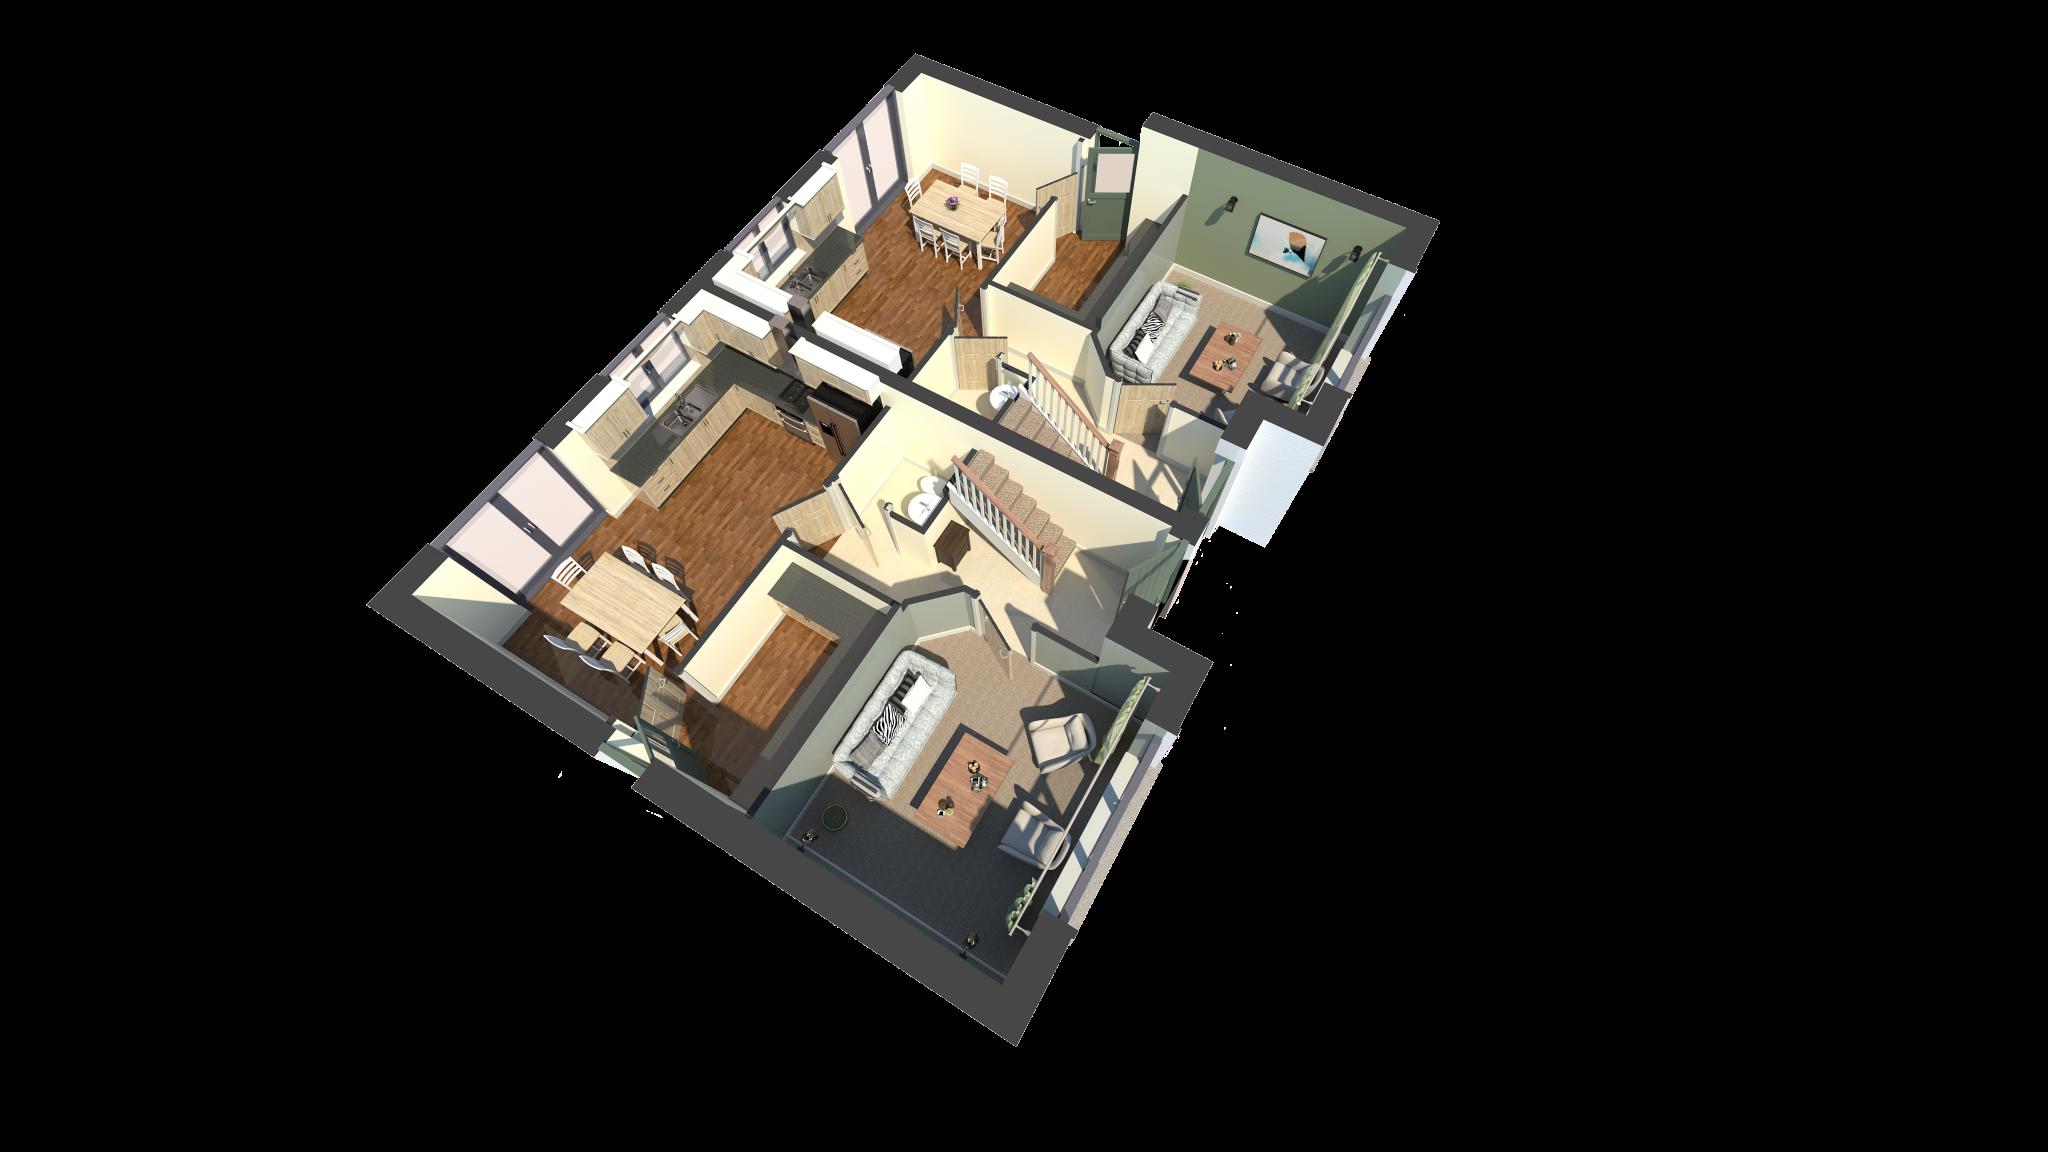 House Type C GF Plan View Altered-Scene 2 v3